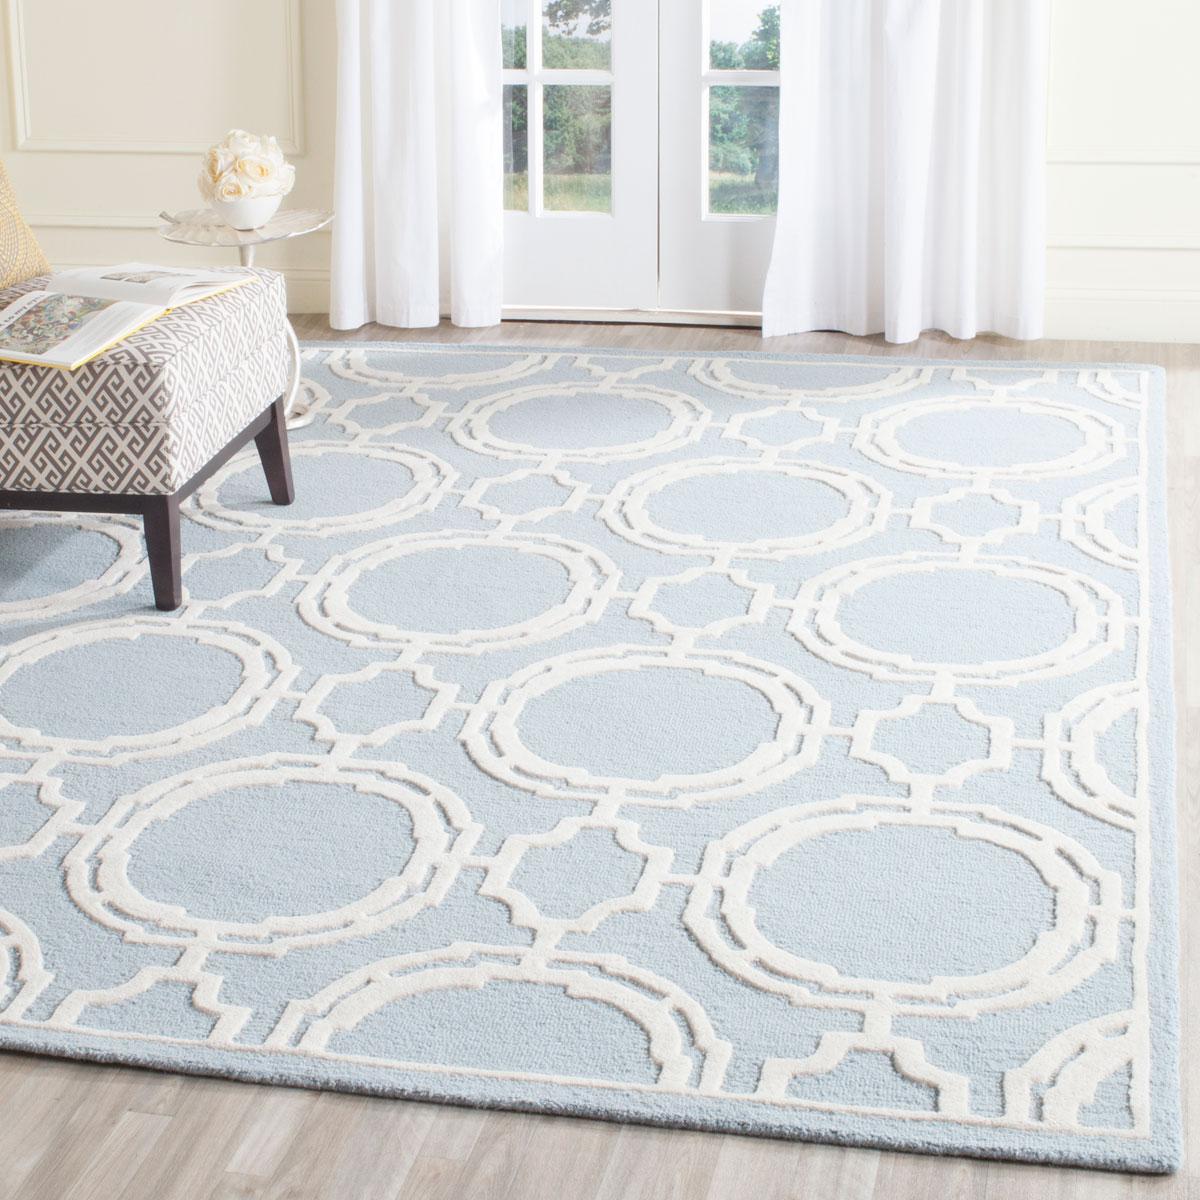 Gorgeous Pale Blue/ivory Geometric/trellis Rug